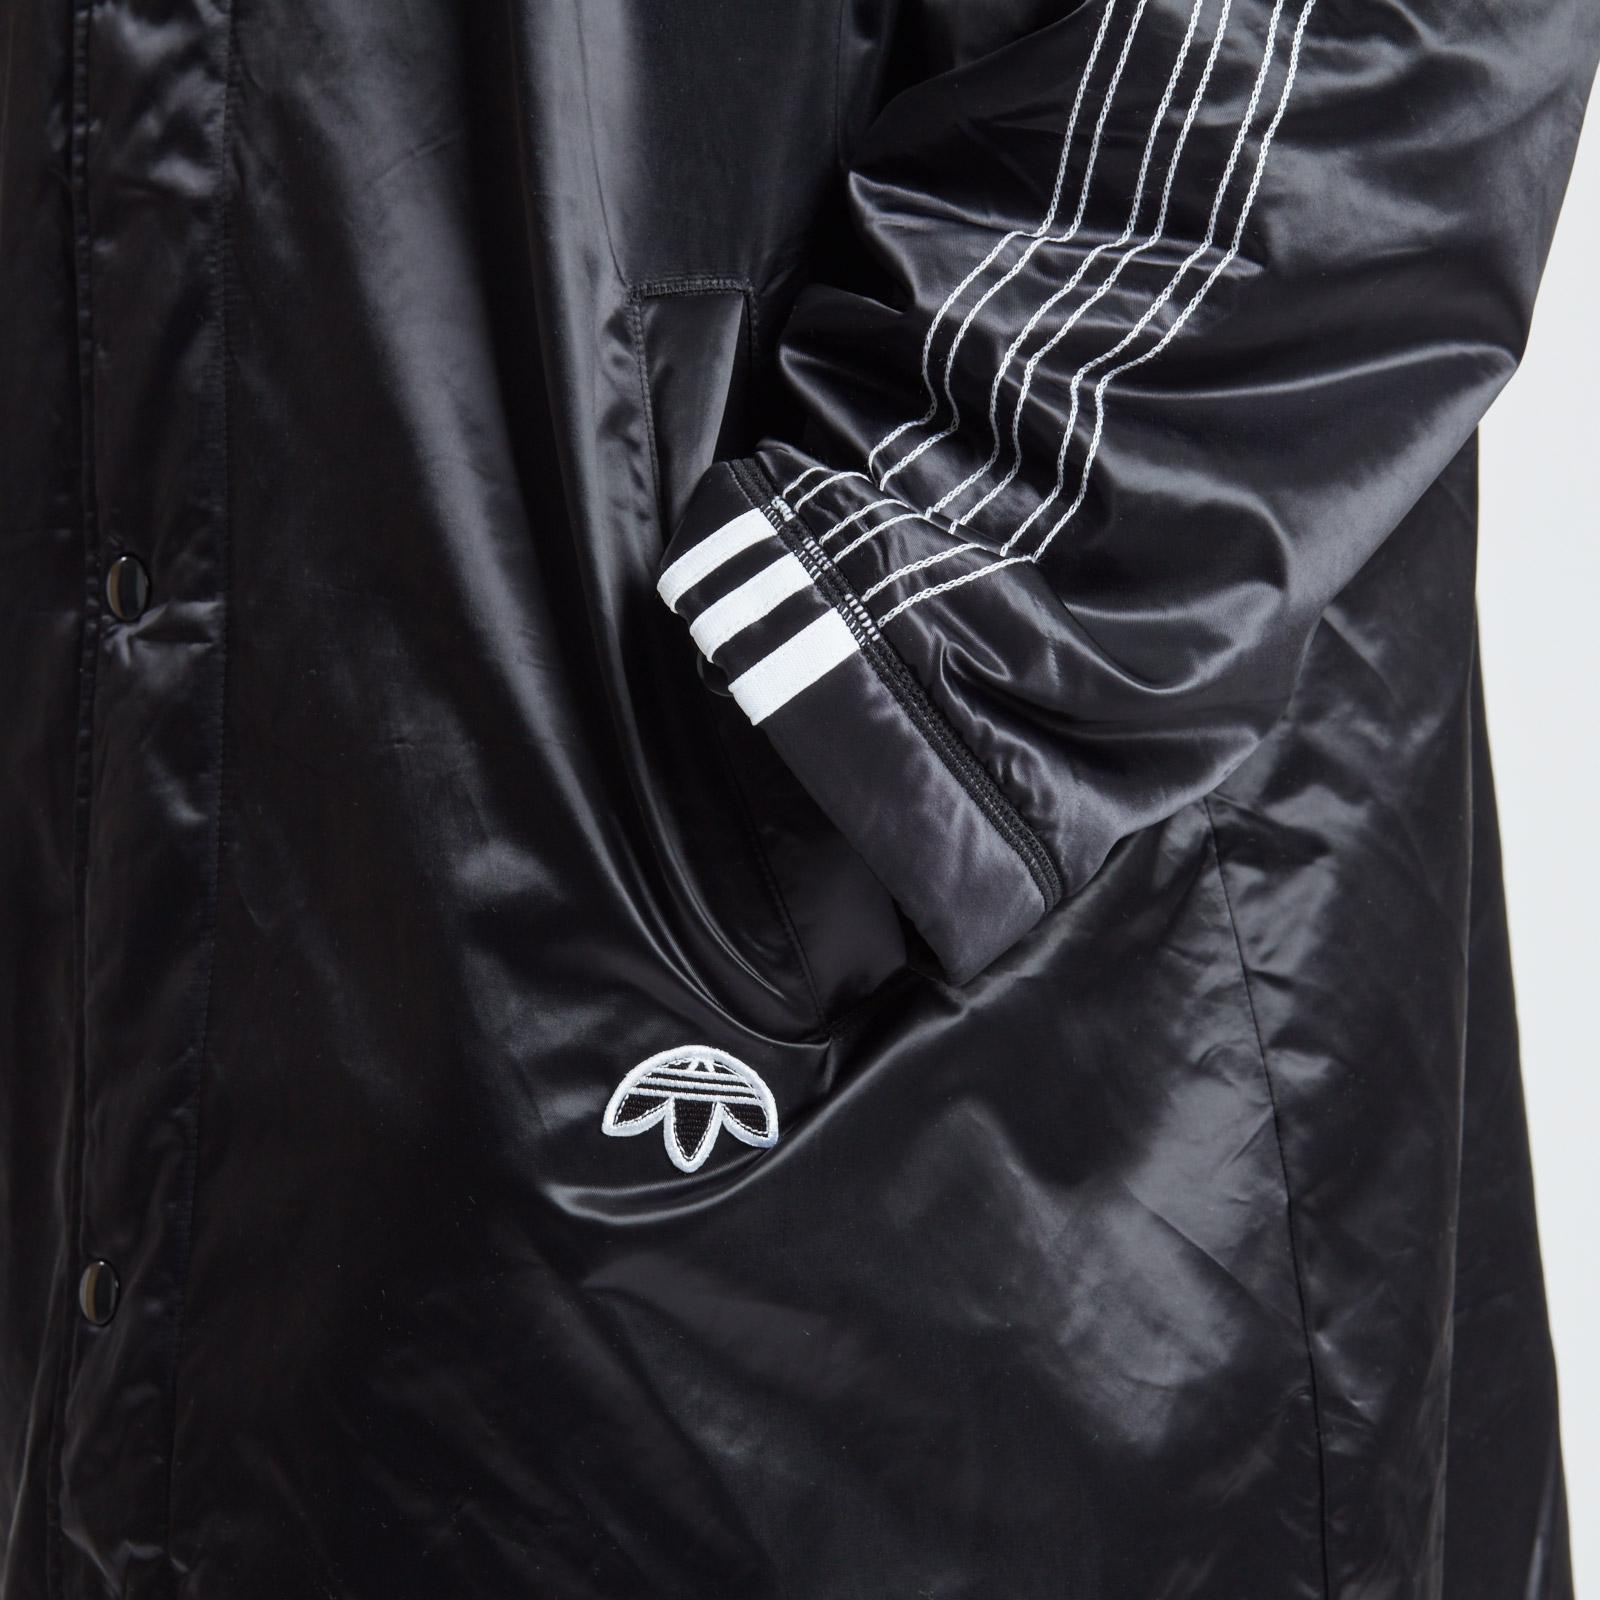 8c8b5fc79334 adidas Originals by Alexander Wang Stadium Jacket - 8. Close